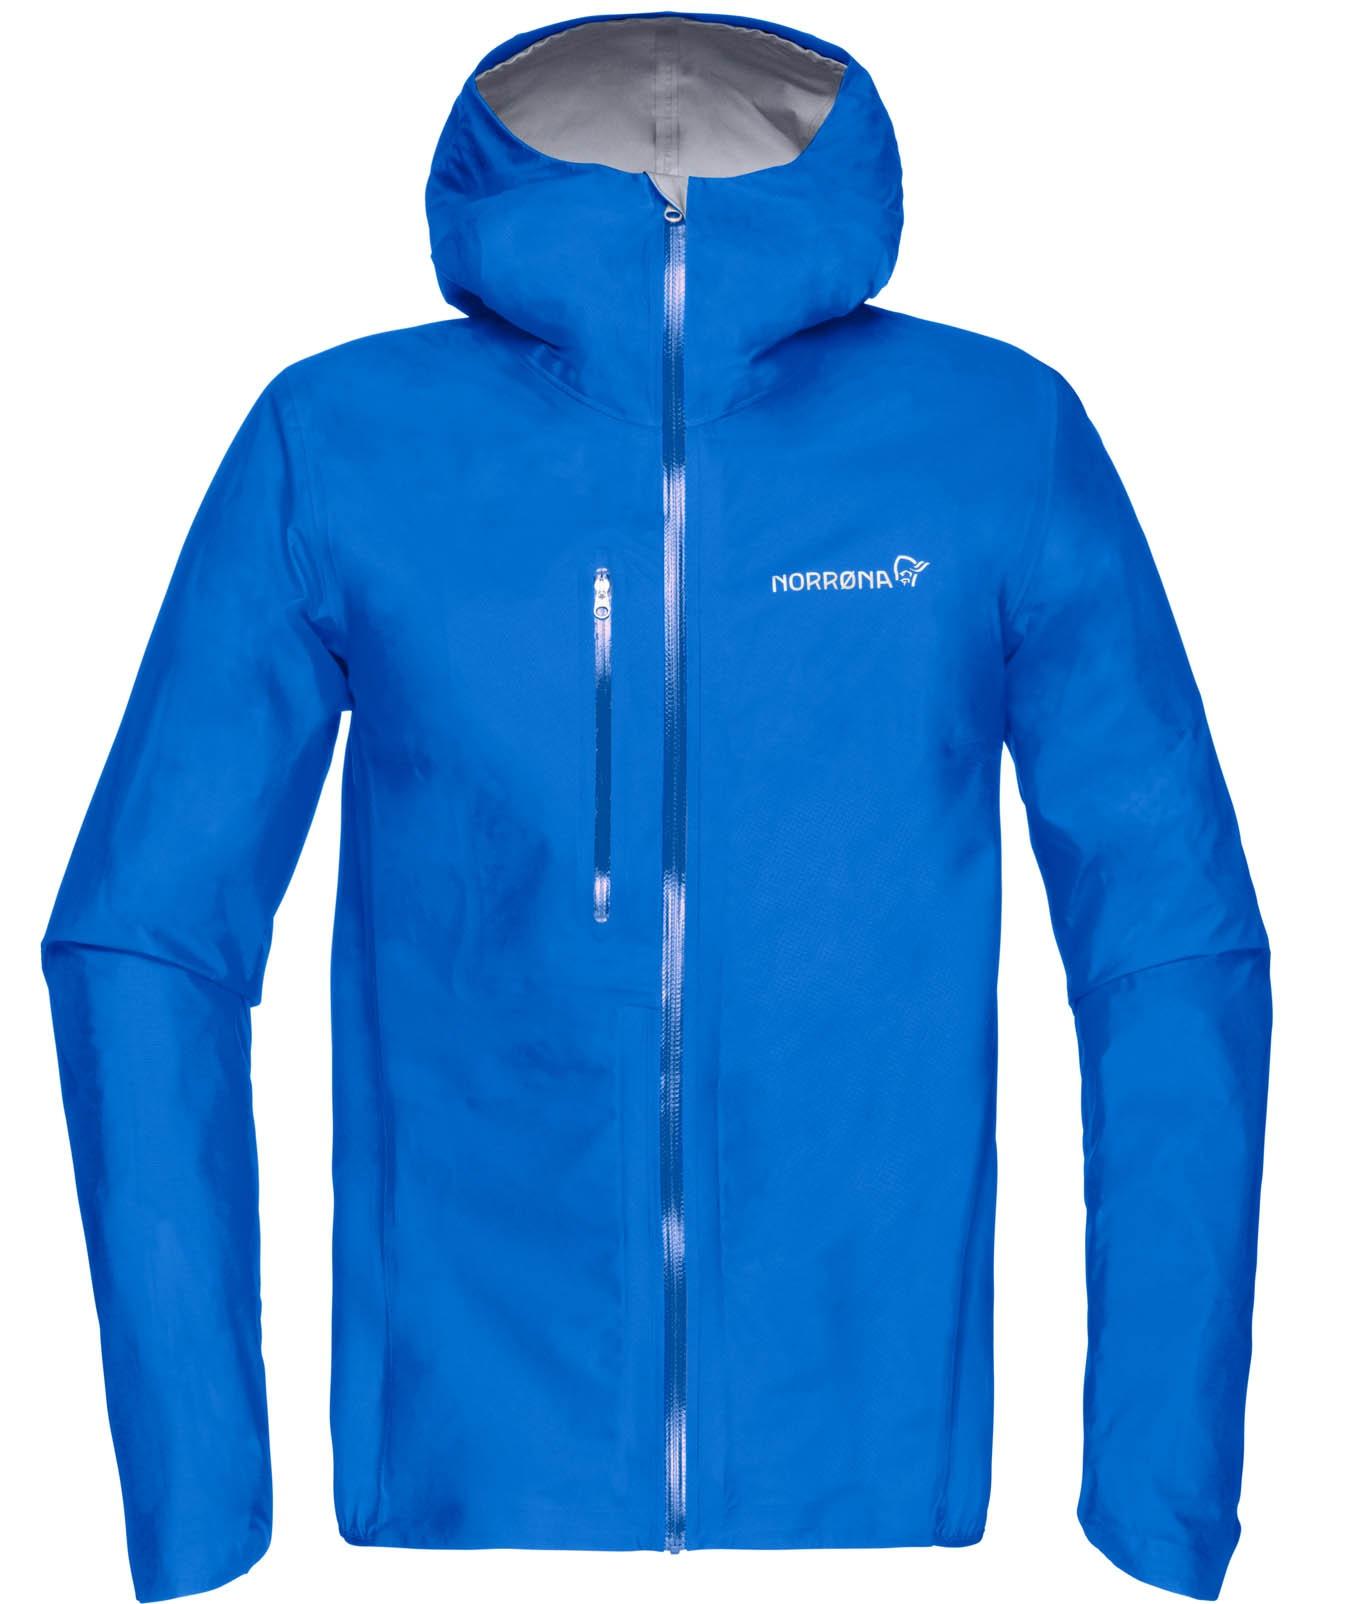 Bitihorn Gore Tex Active 2.0 Jacket (M) Hot Sapphire